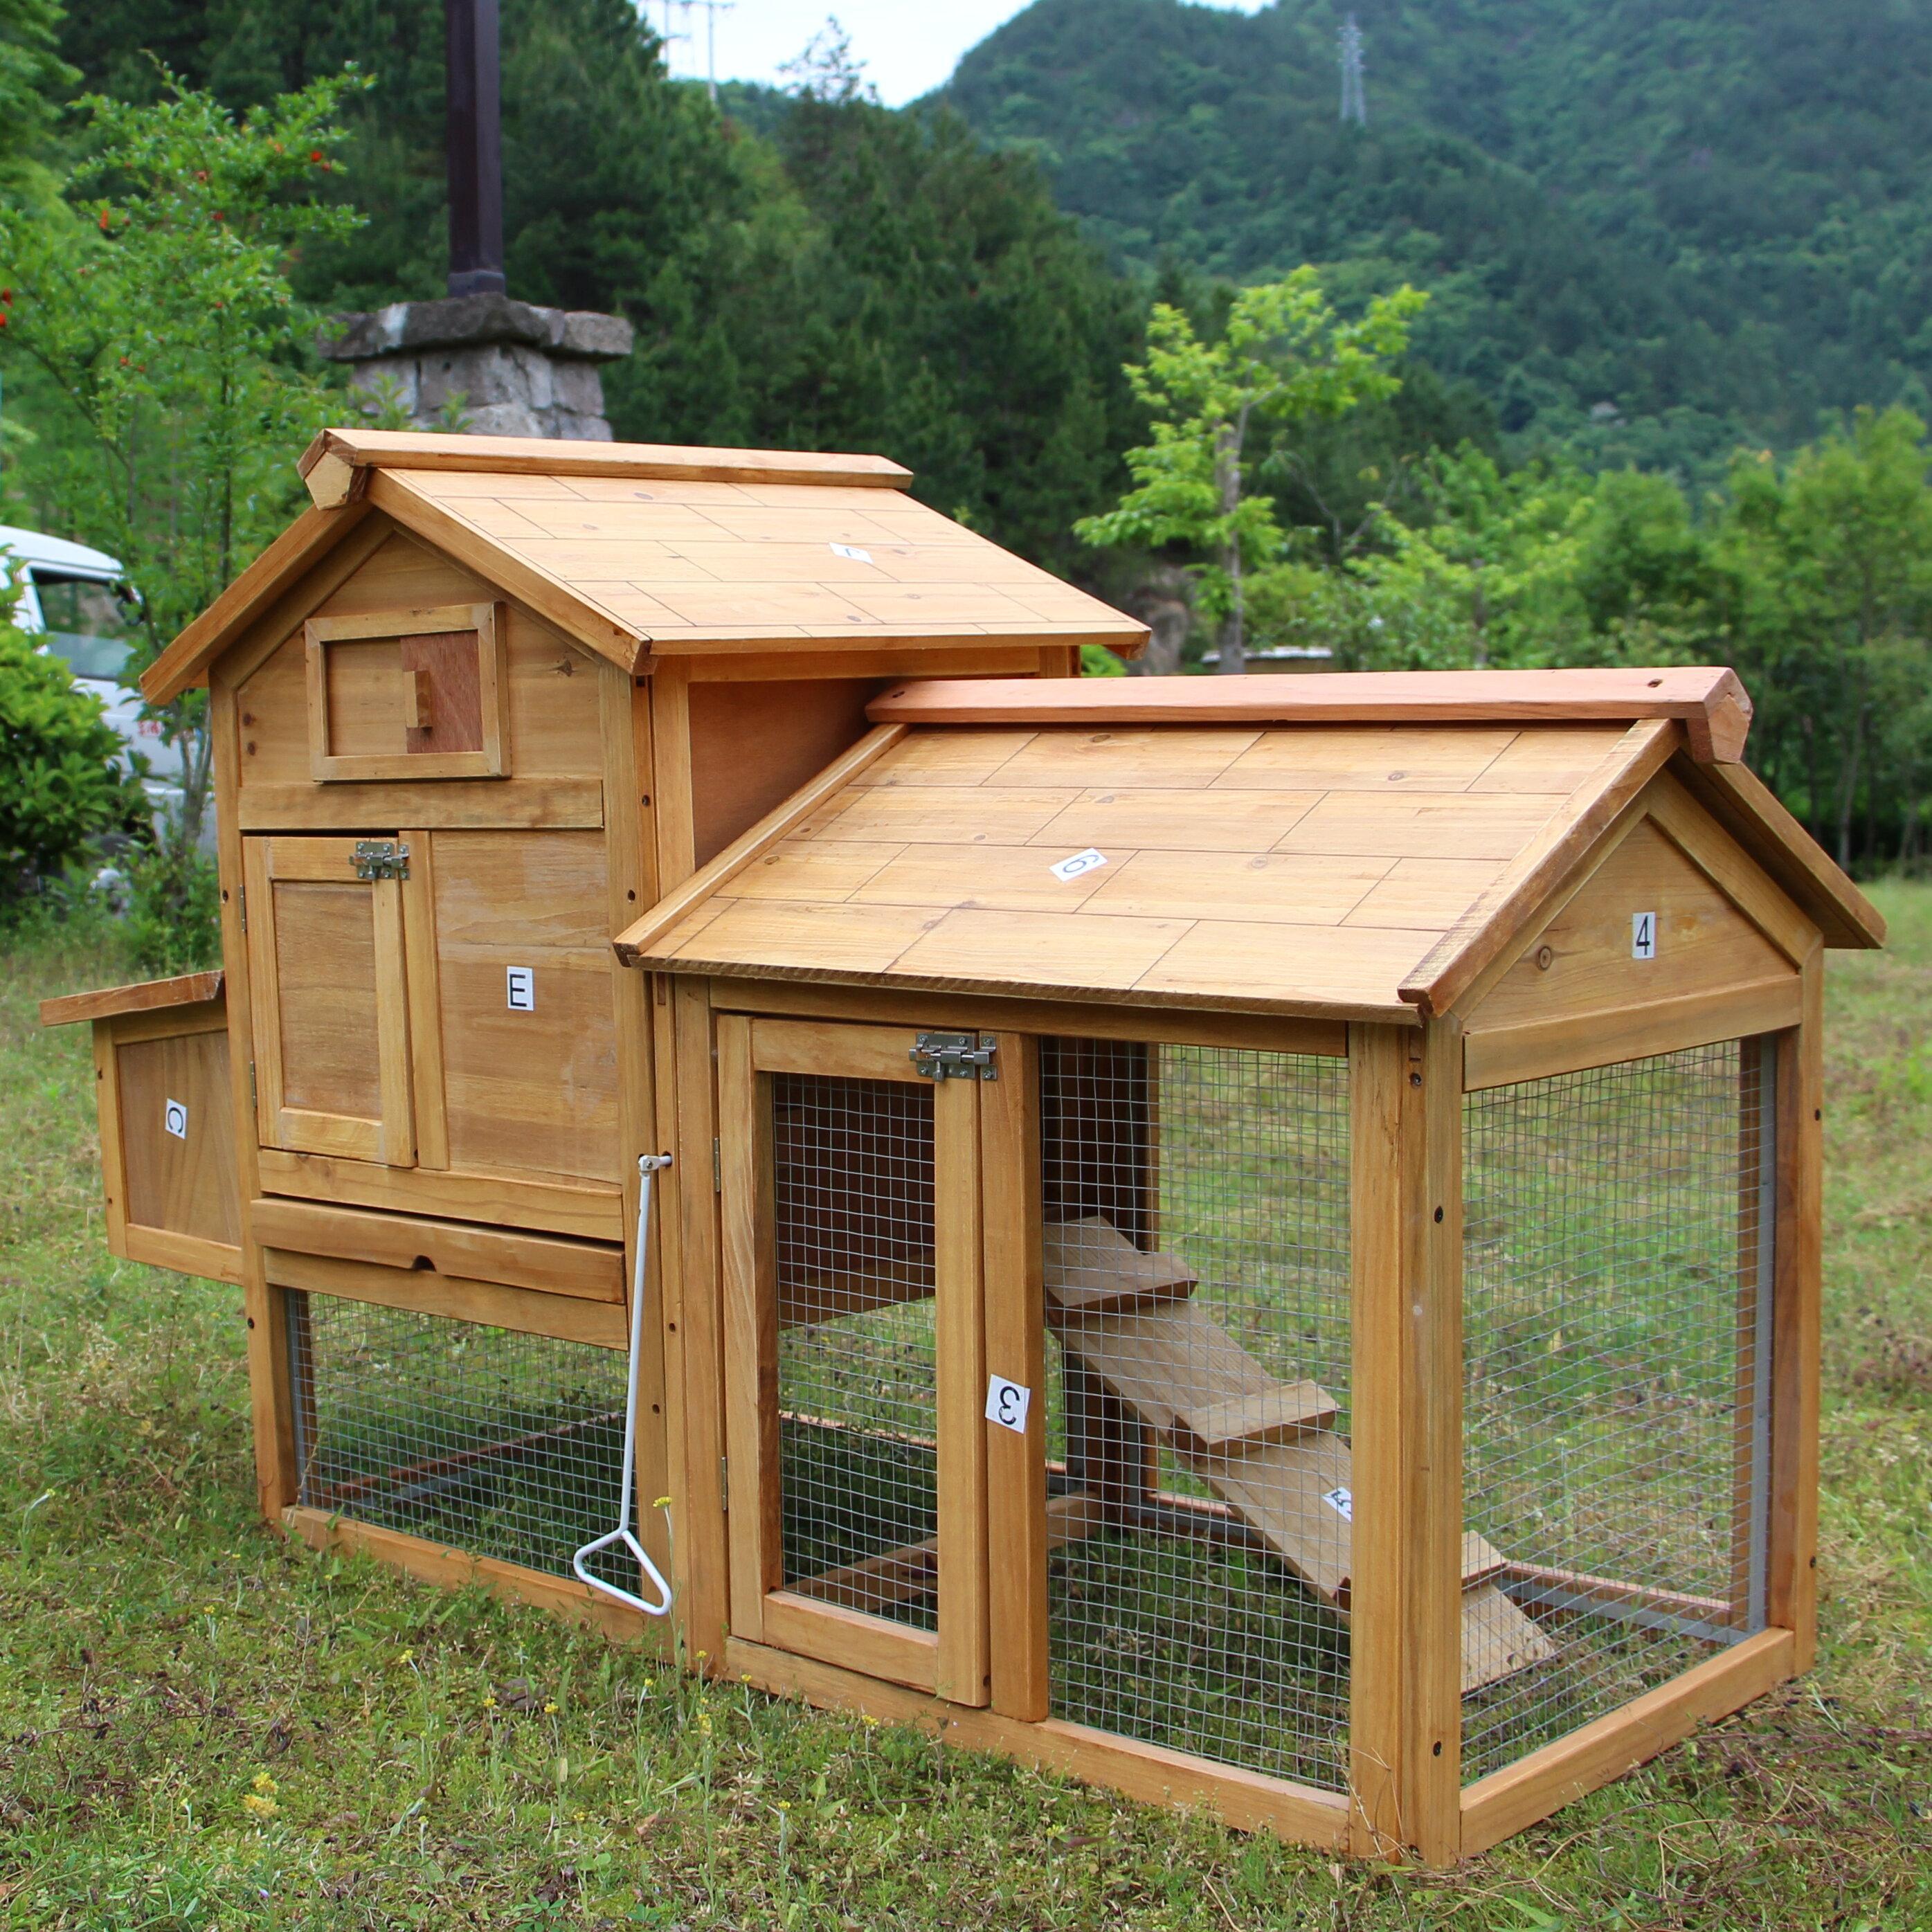 solid htm rabbit hutch original gardensite uk co structures garden run wood kendal and x